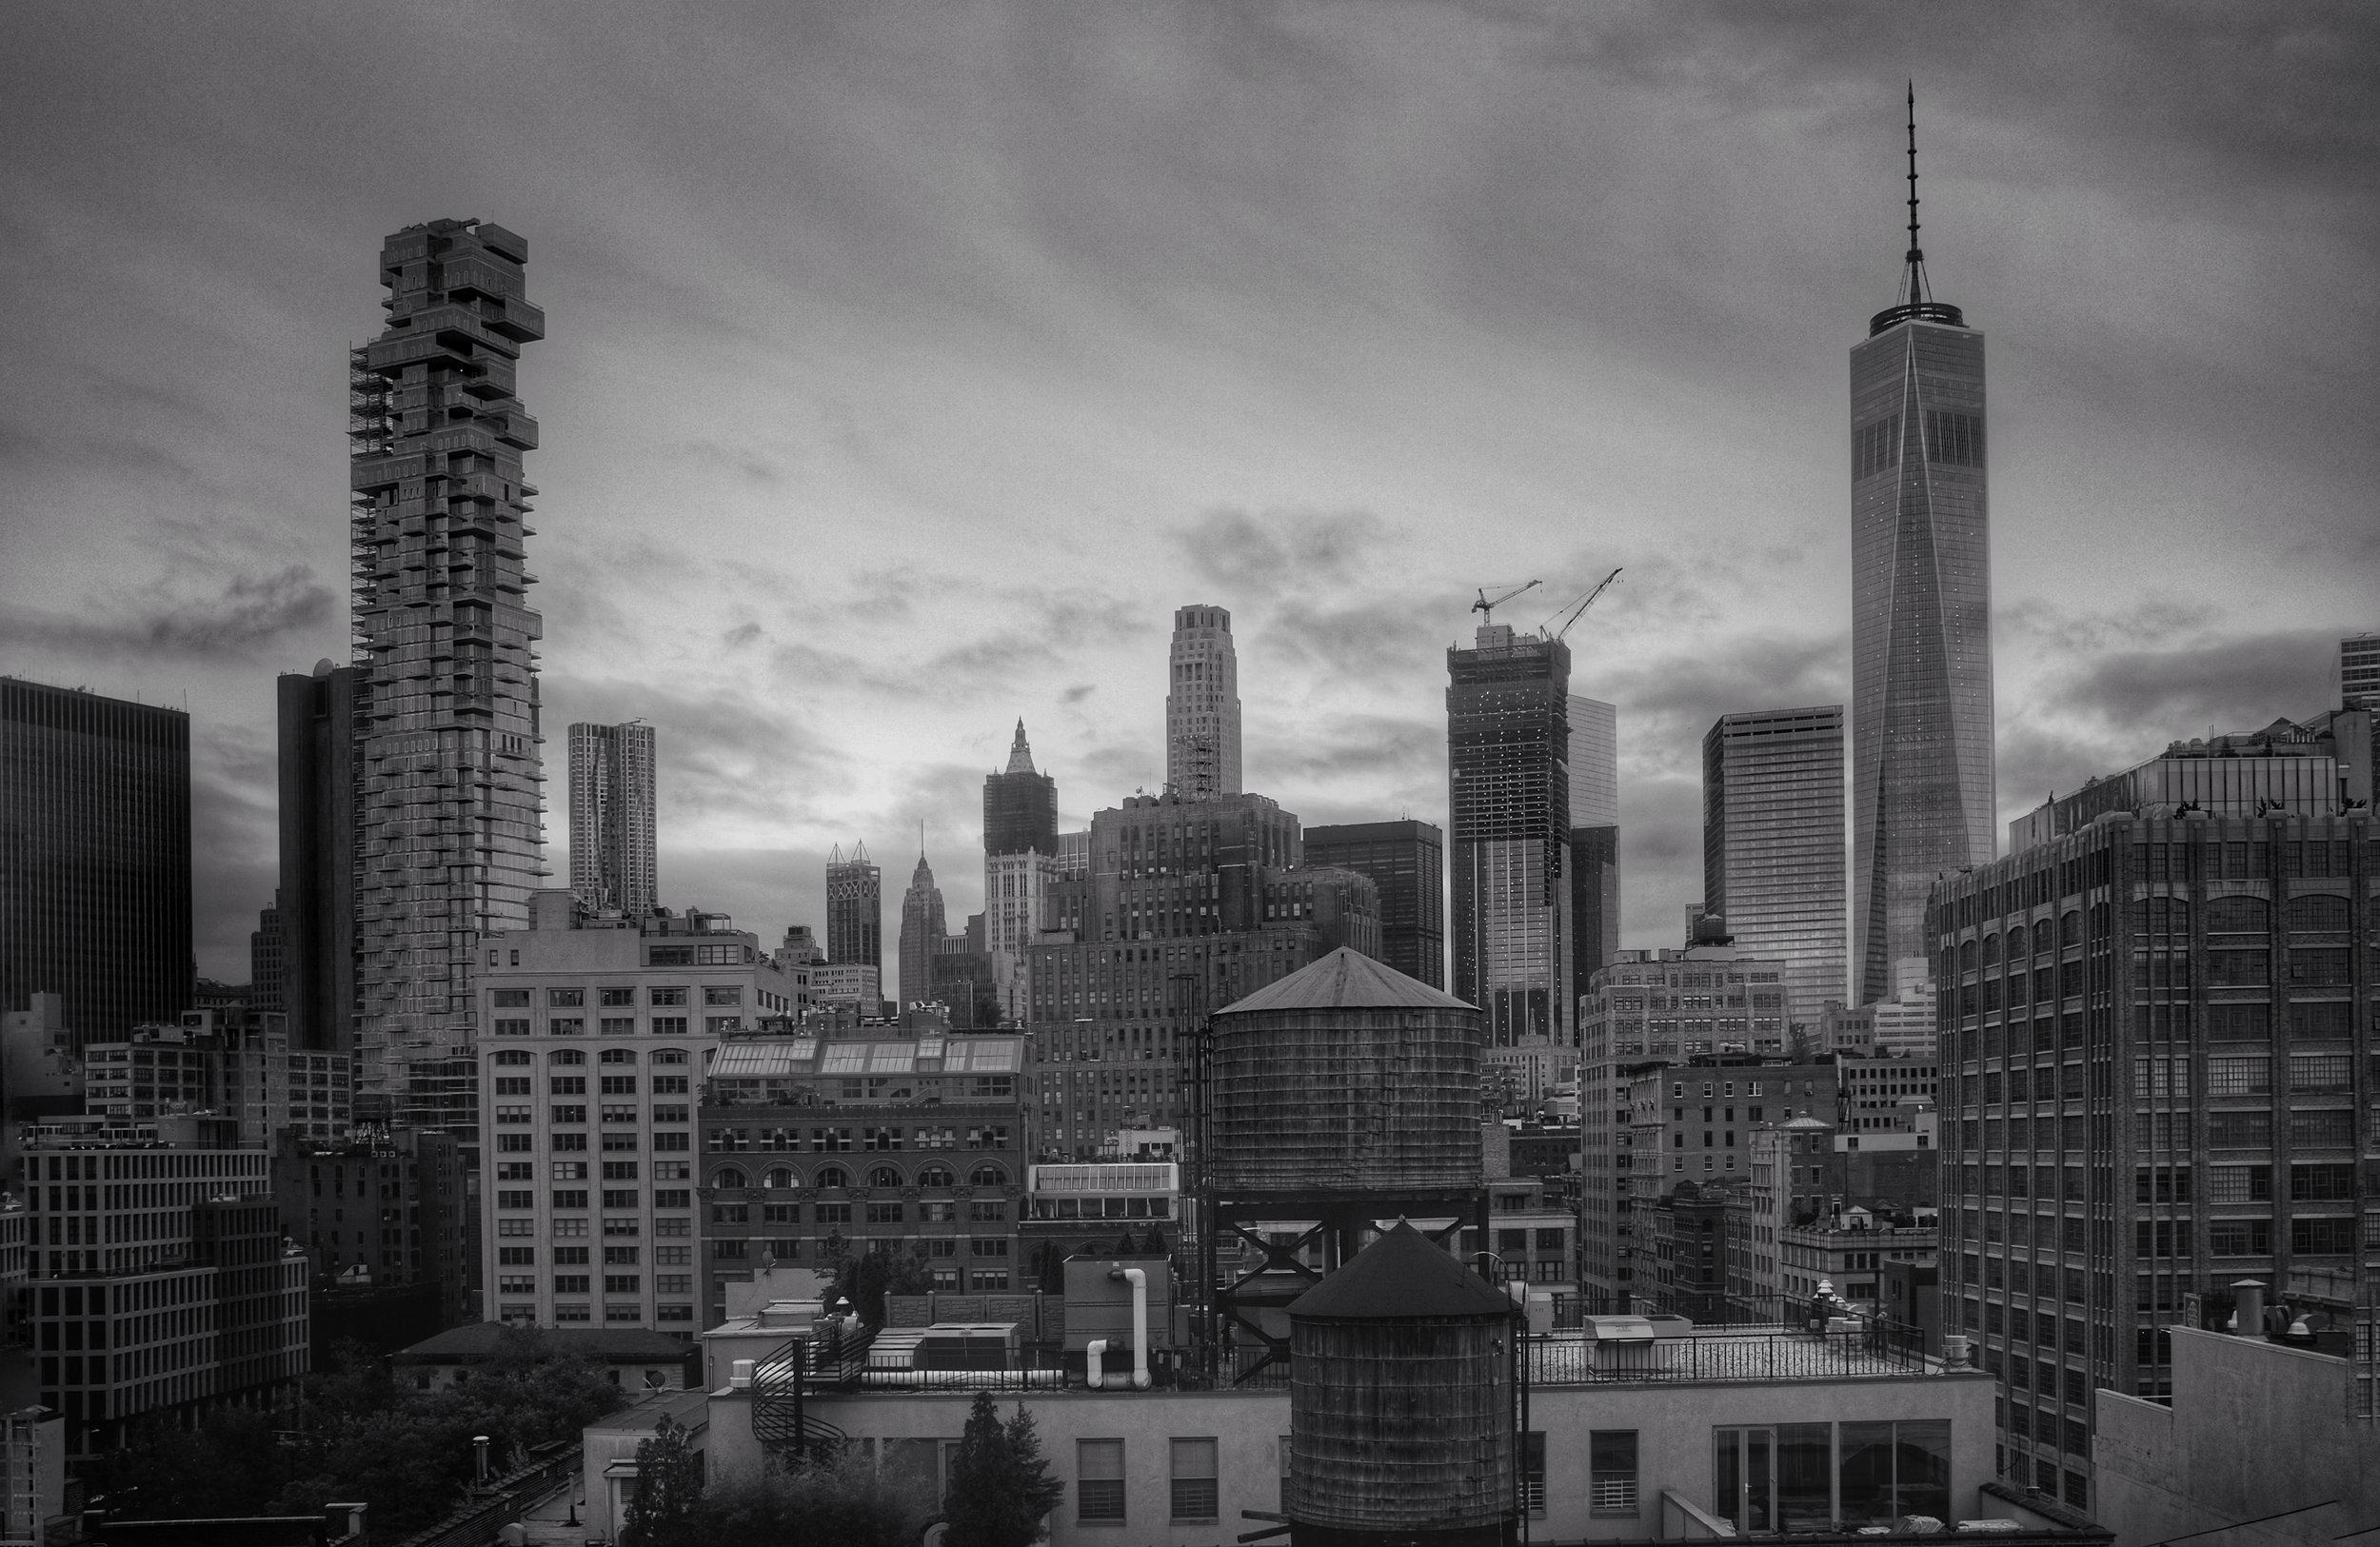 Lower Manhattan from TriBeCa. New York City. 2016.